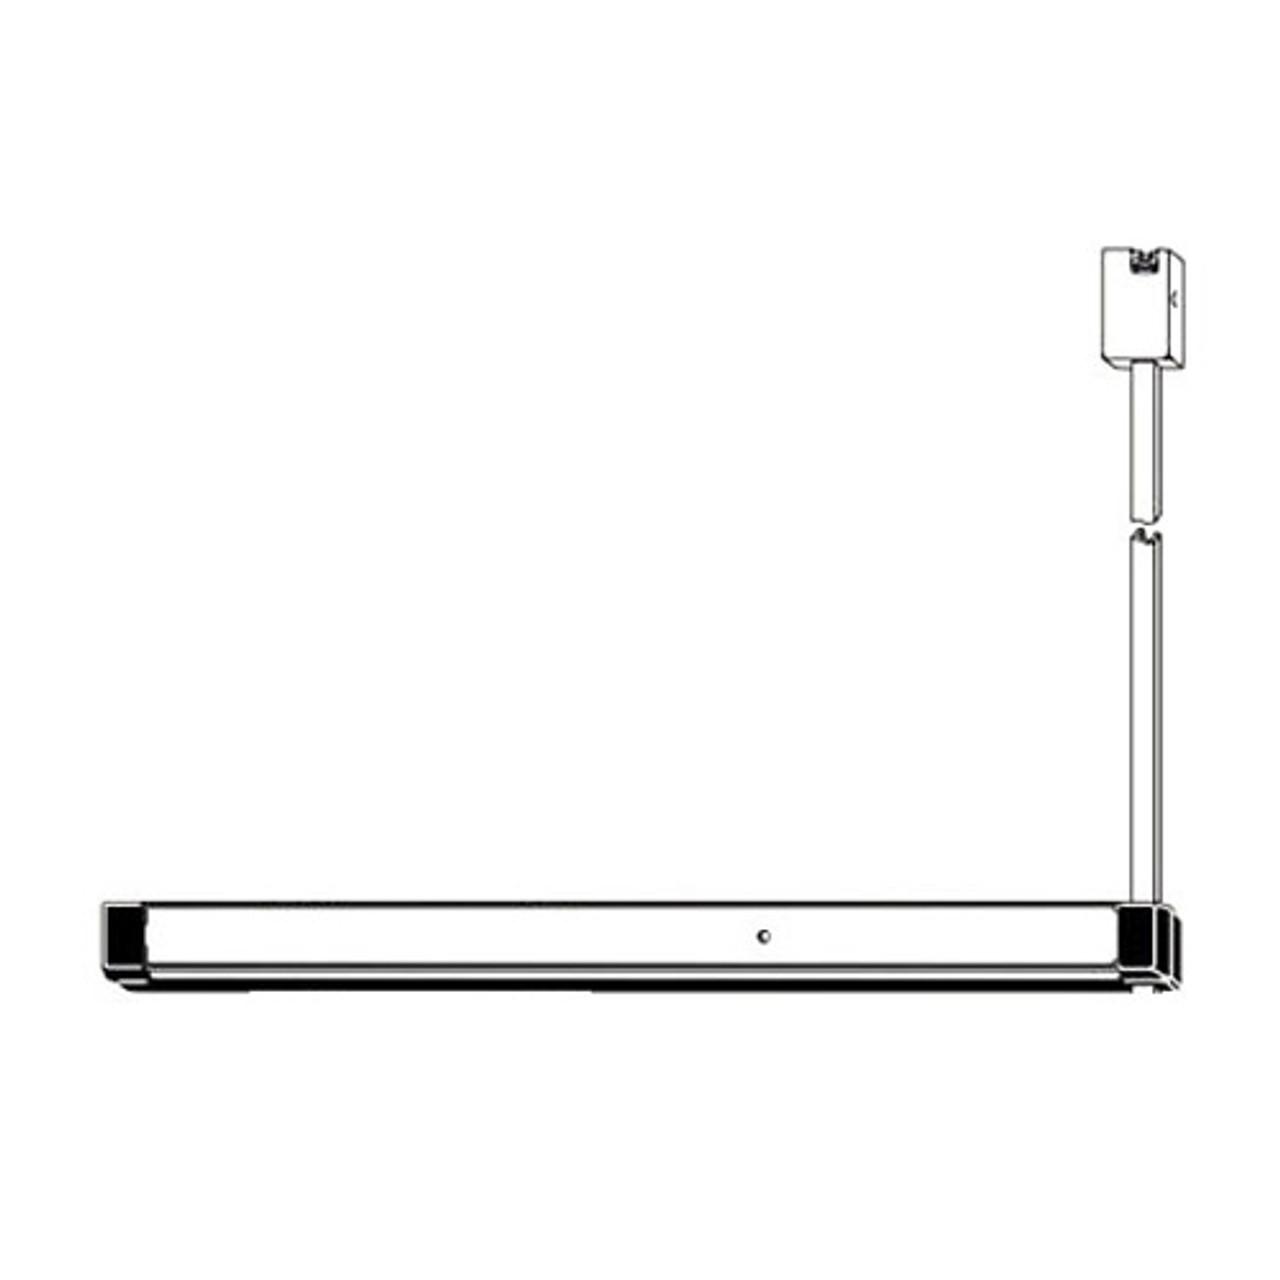 8222T-EDM2-42 Adams Rite Narrow Stile Surface Vertical Rod Exit Device in Dark Bronze